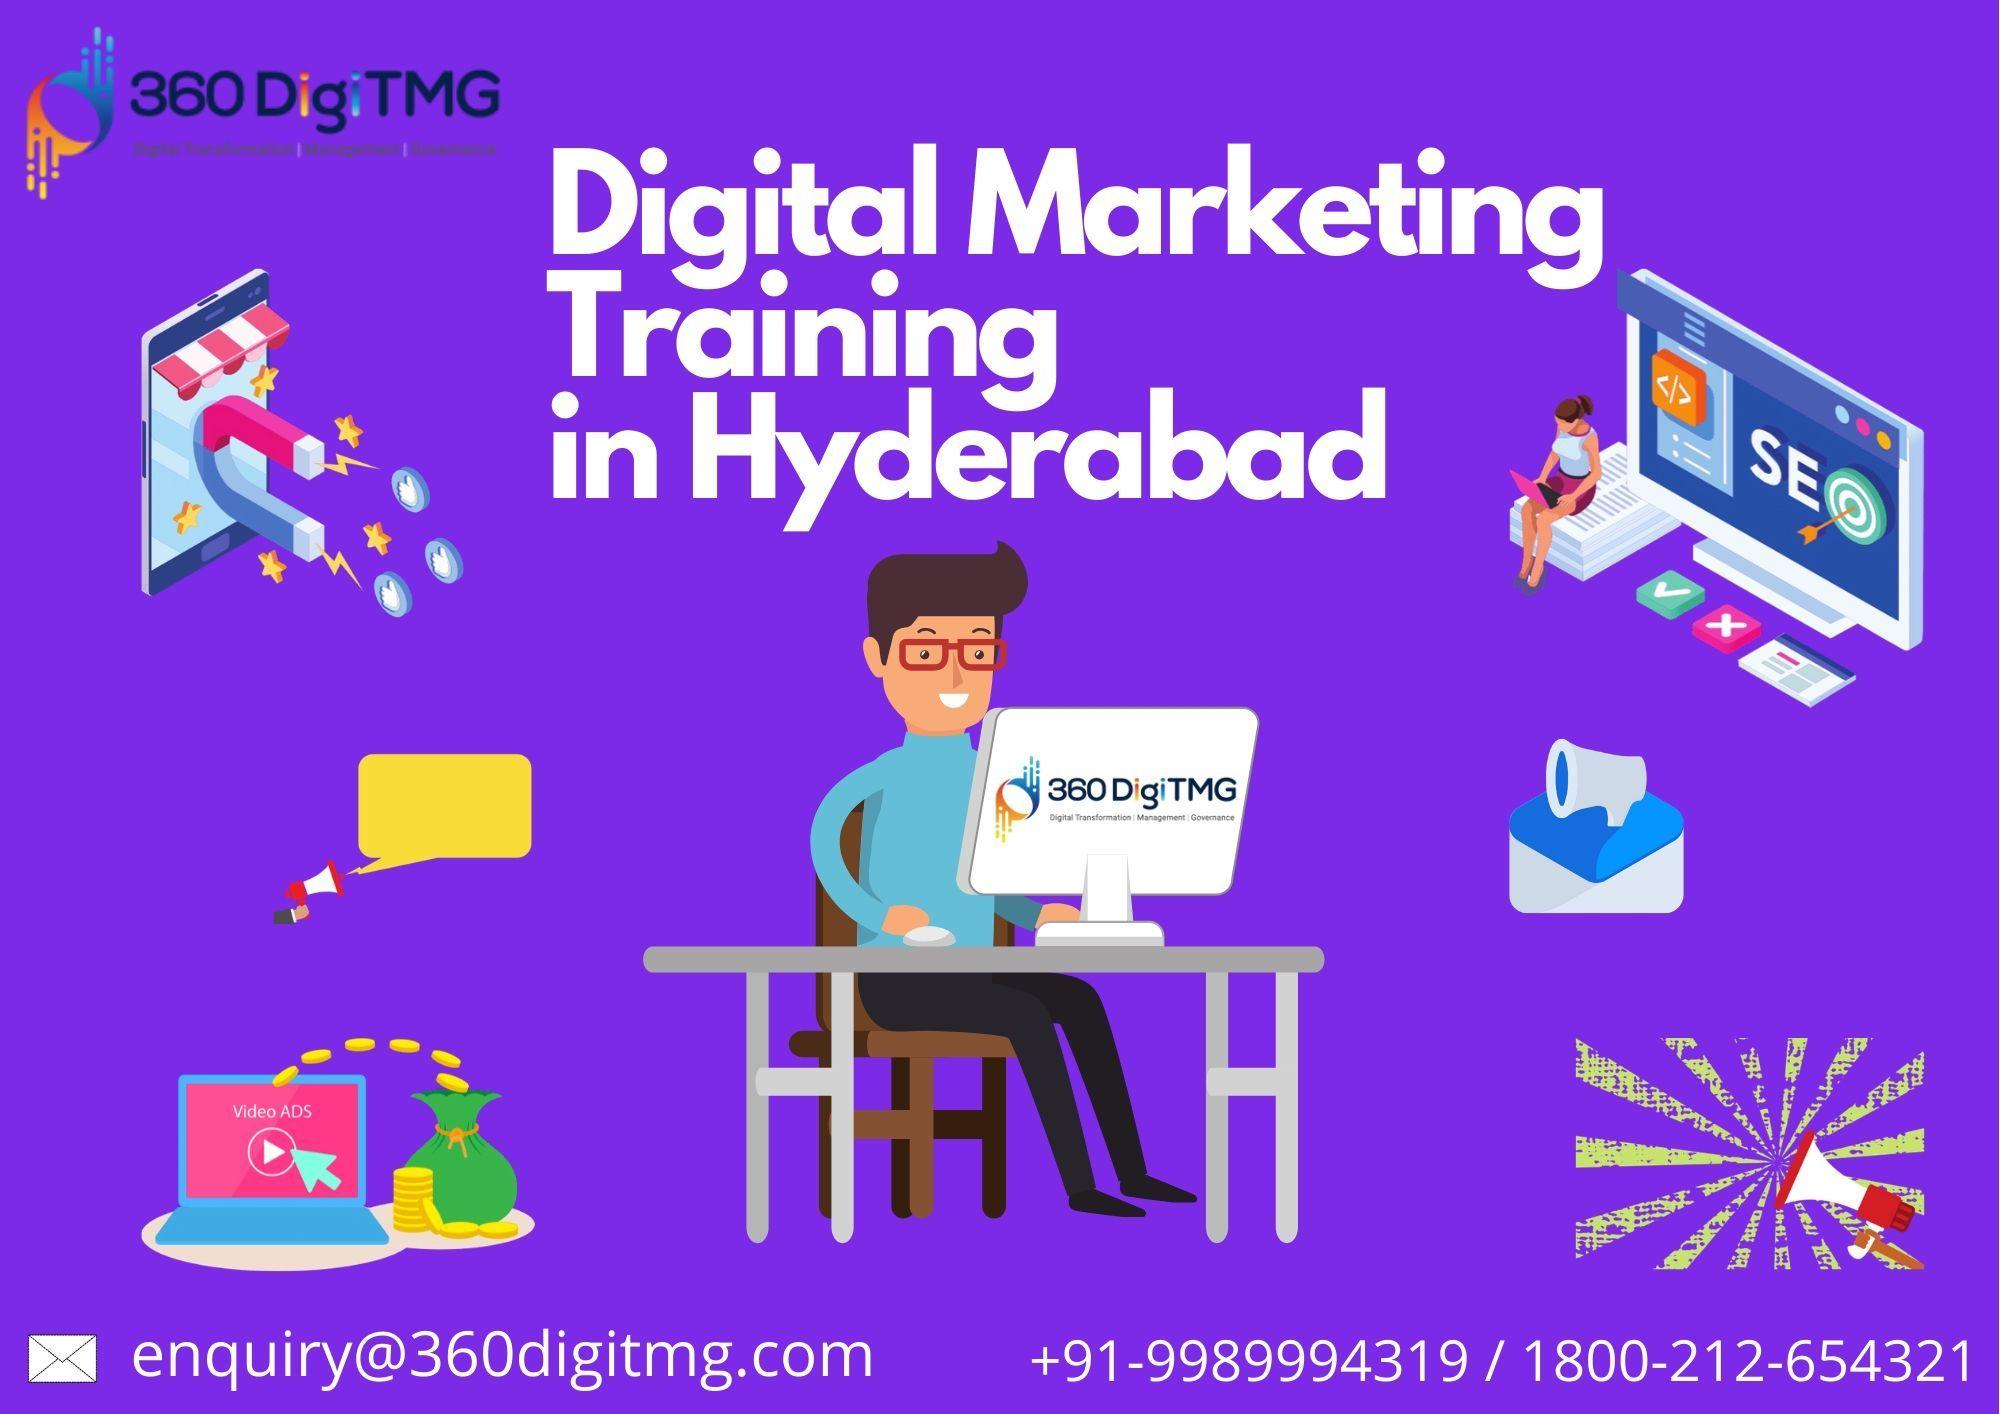 Digital Marketing Training In Hyderabad Marketing Training Digital Marketing Marketing Courses